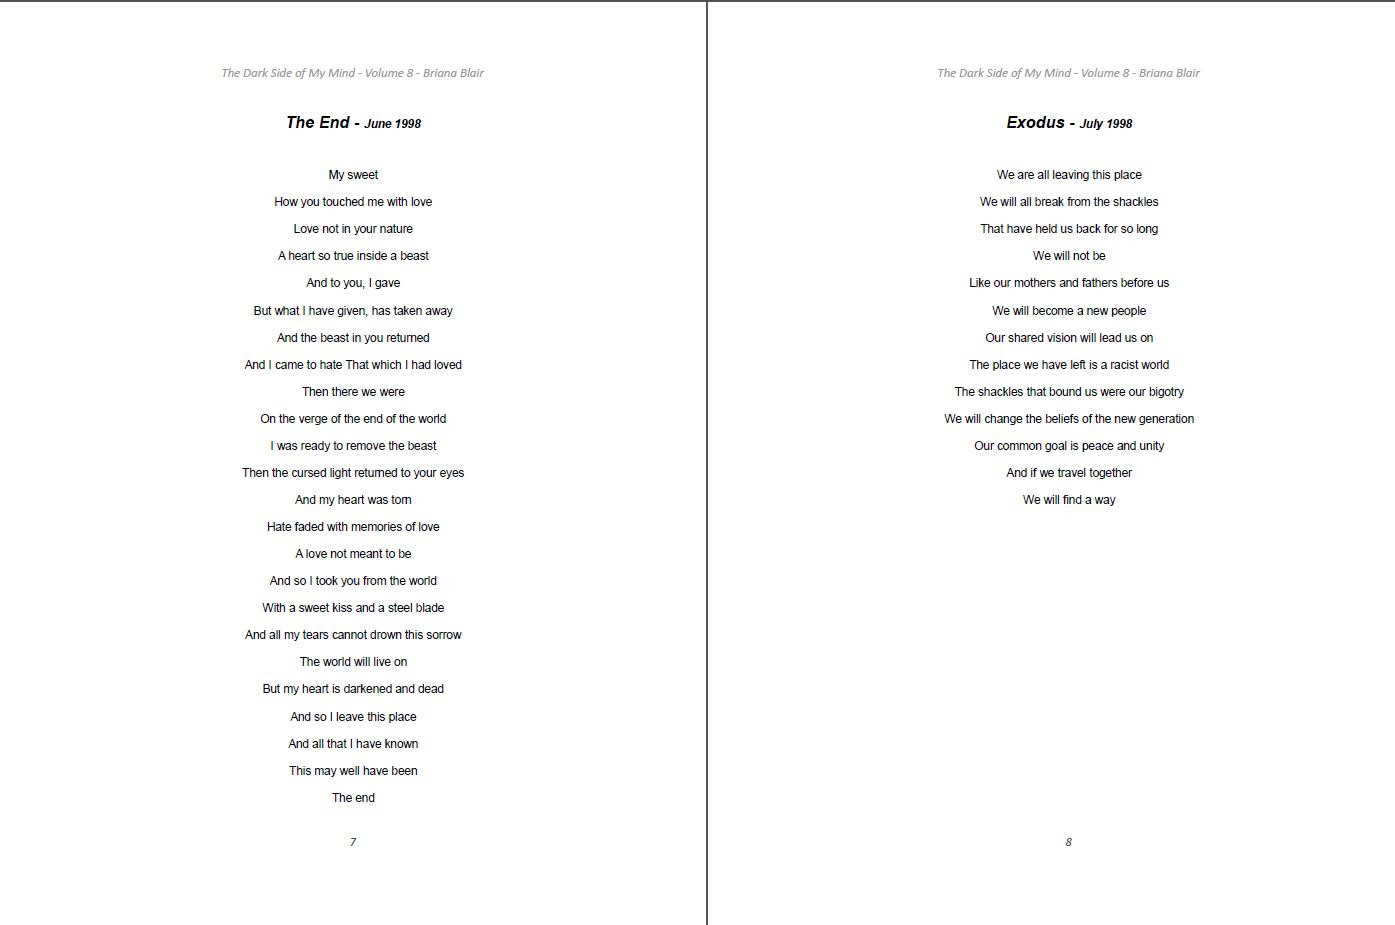 The Dark Side of My Mind - Volume 8 By Briana Blair - Poetry